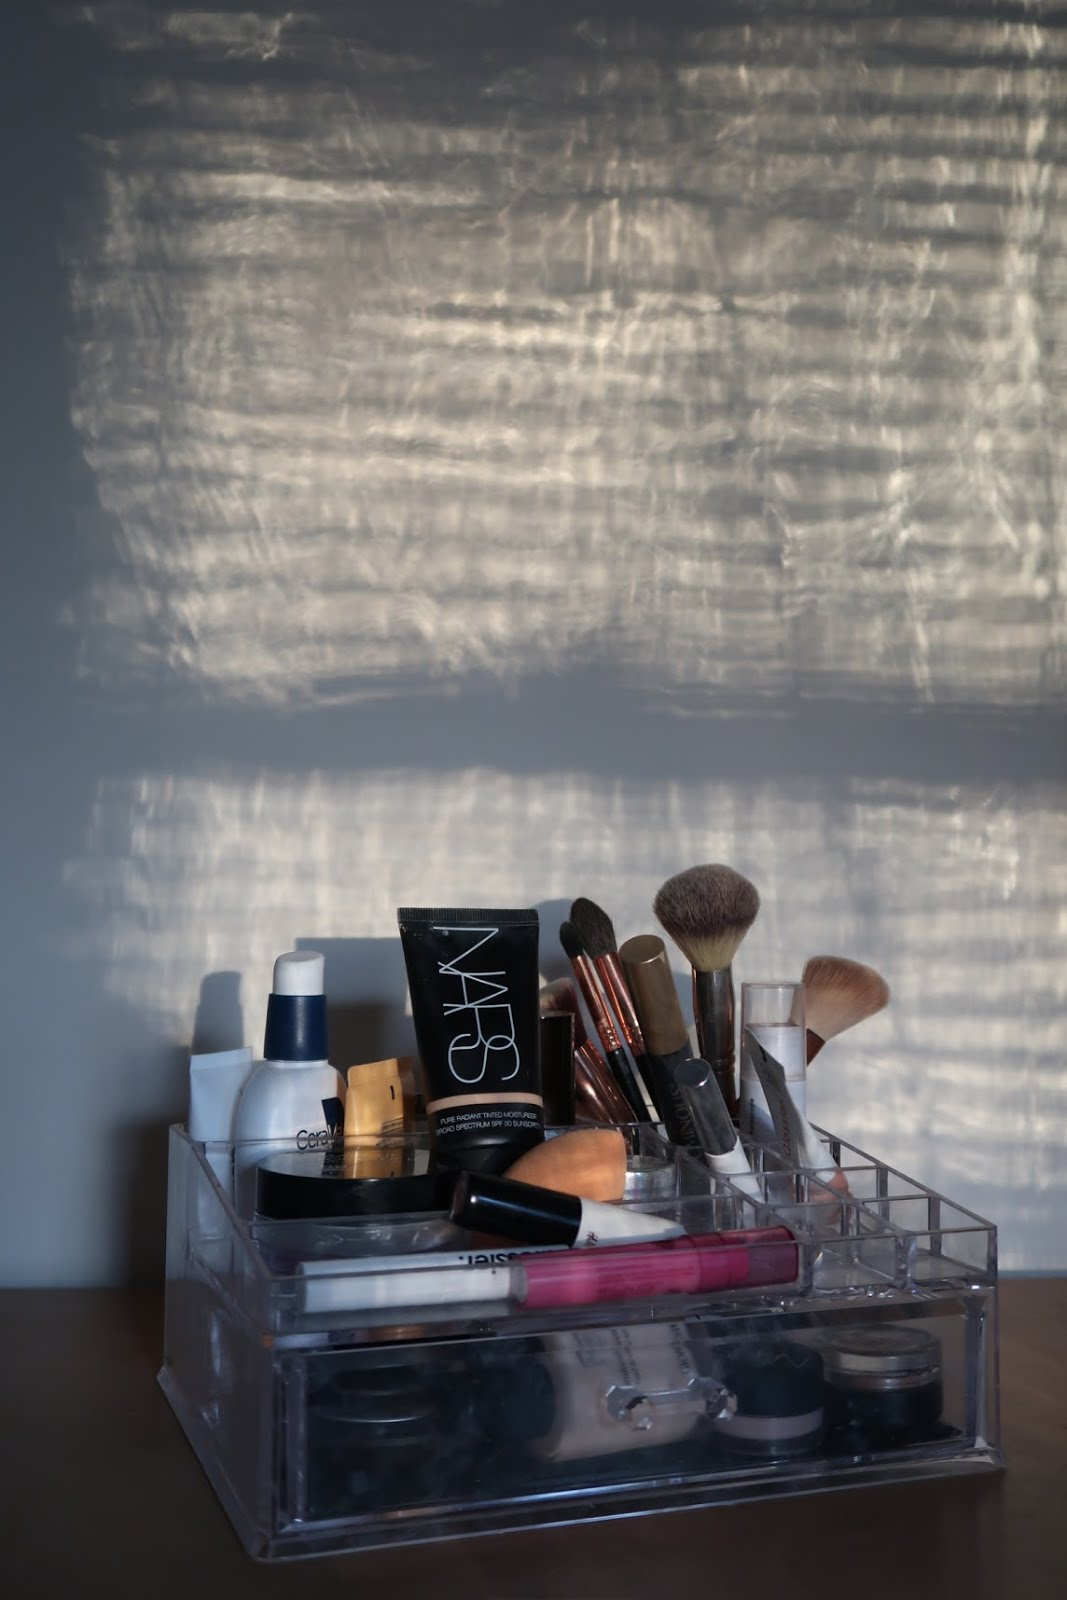 makeup nars acrylic skincare skin brush sigma cerave sun glossier